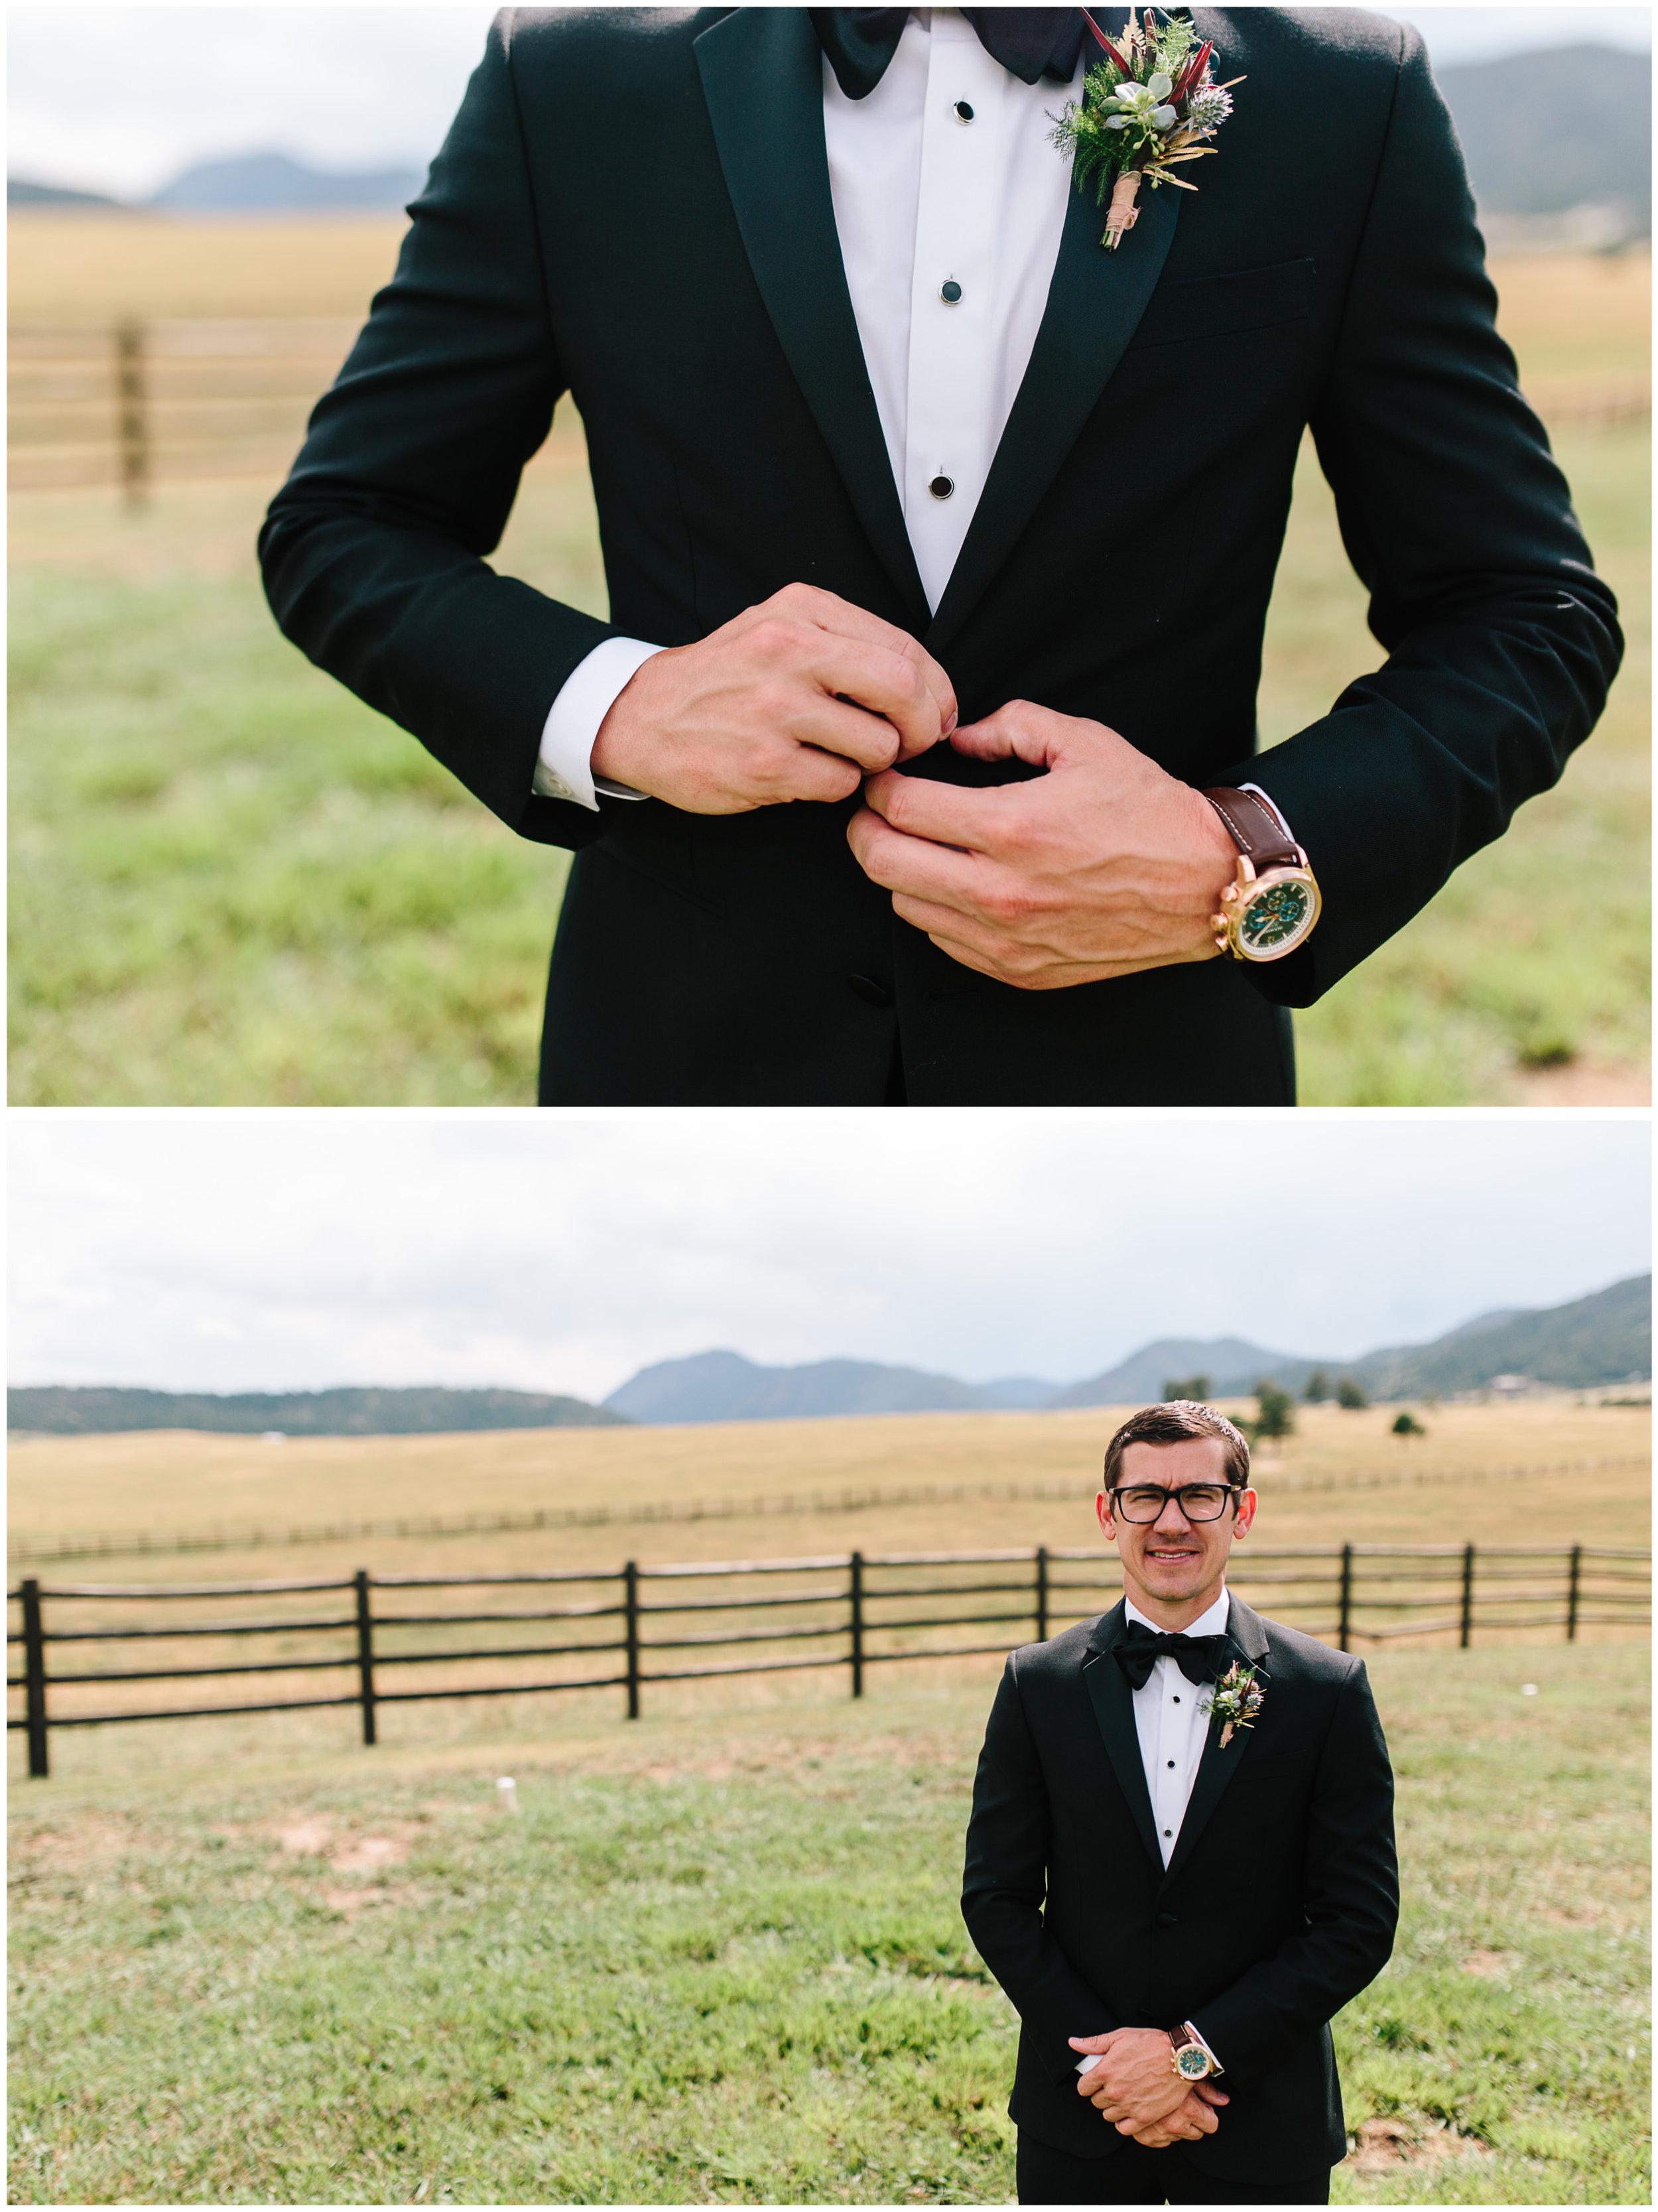 spruce_mountain_ranch_wedding_29.jpg